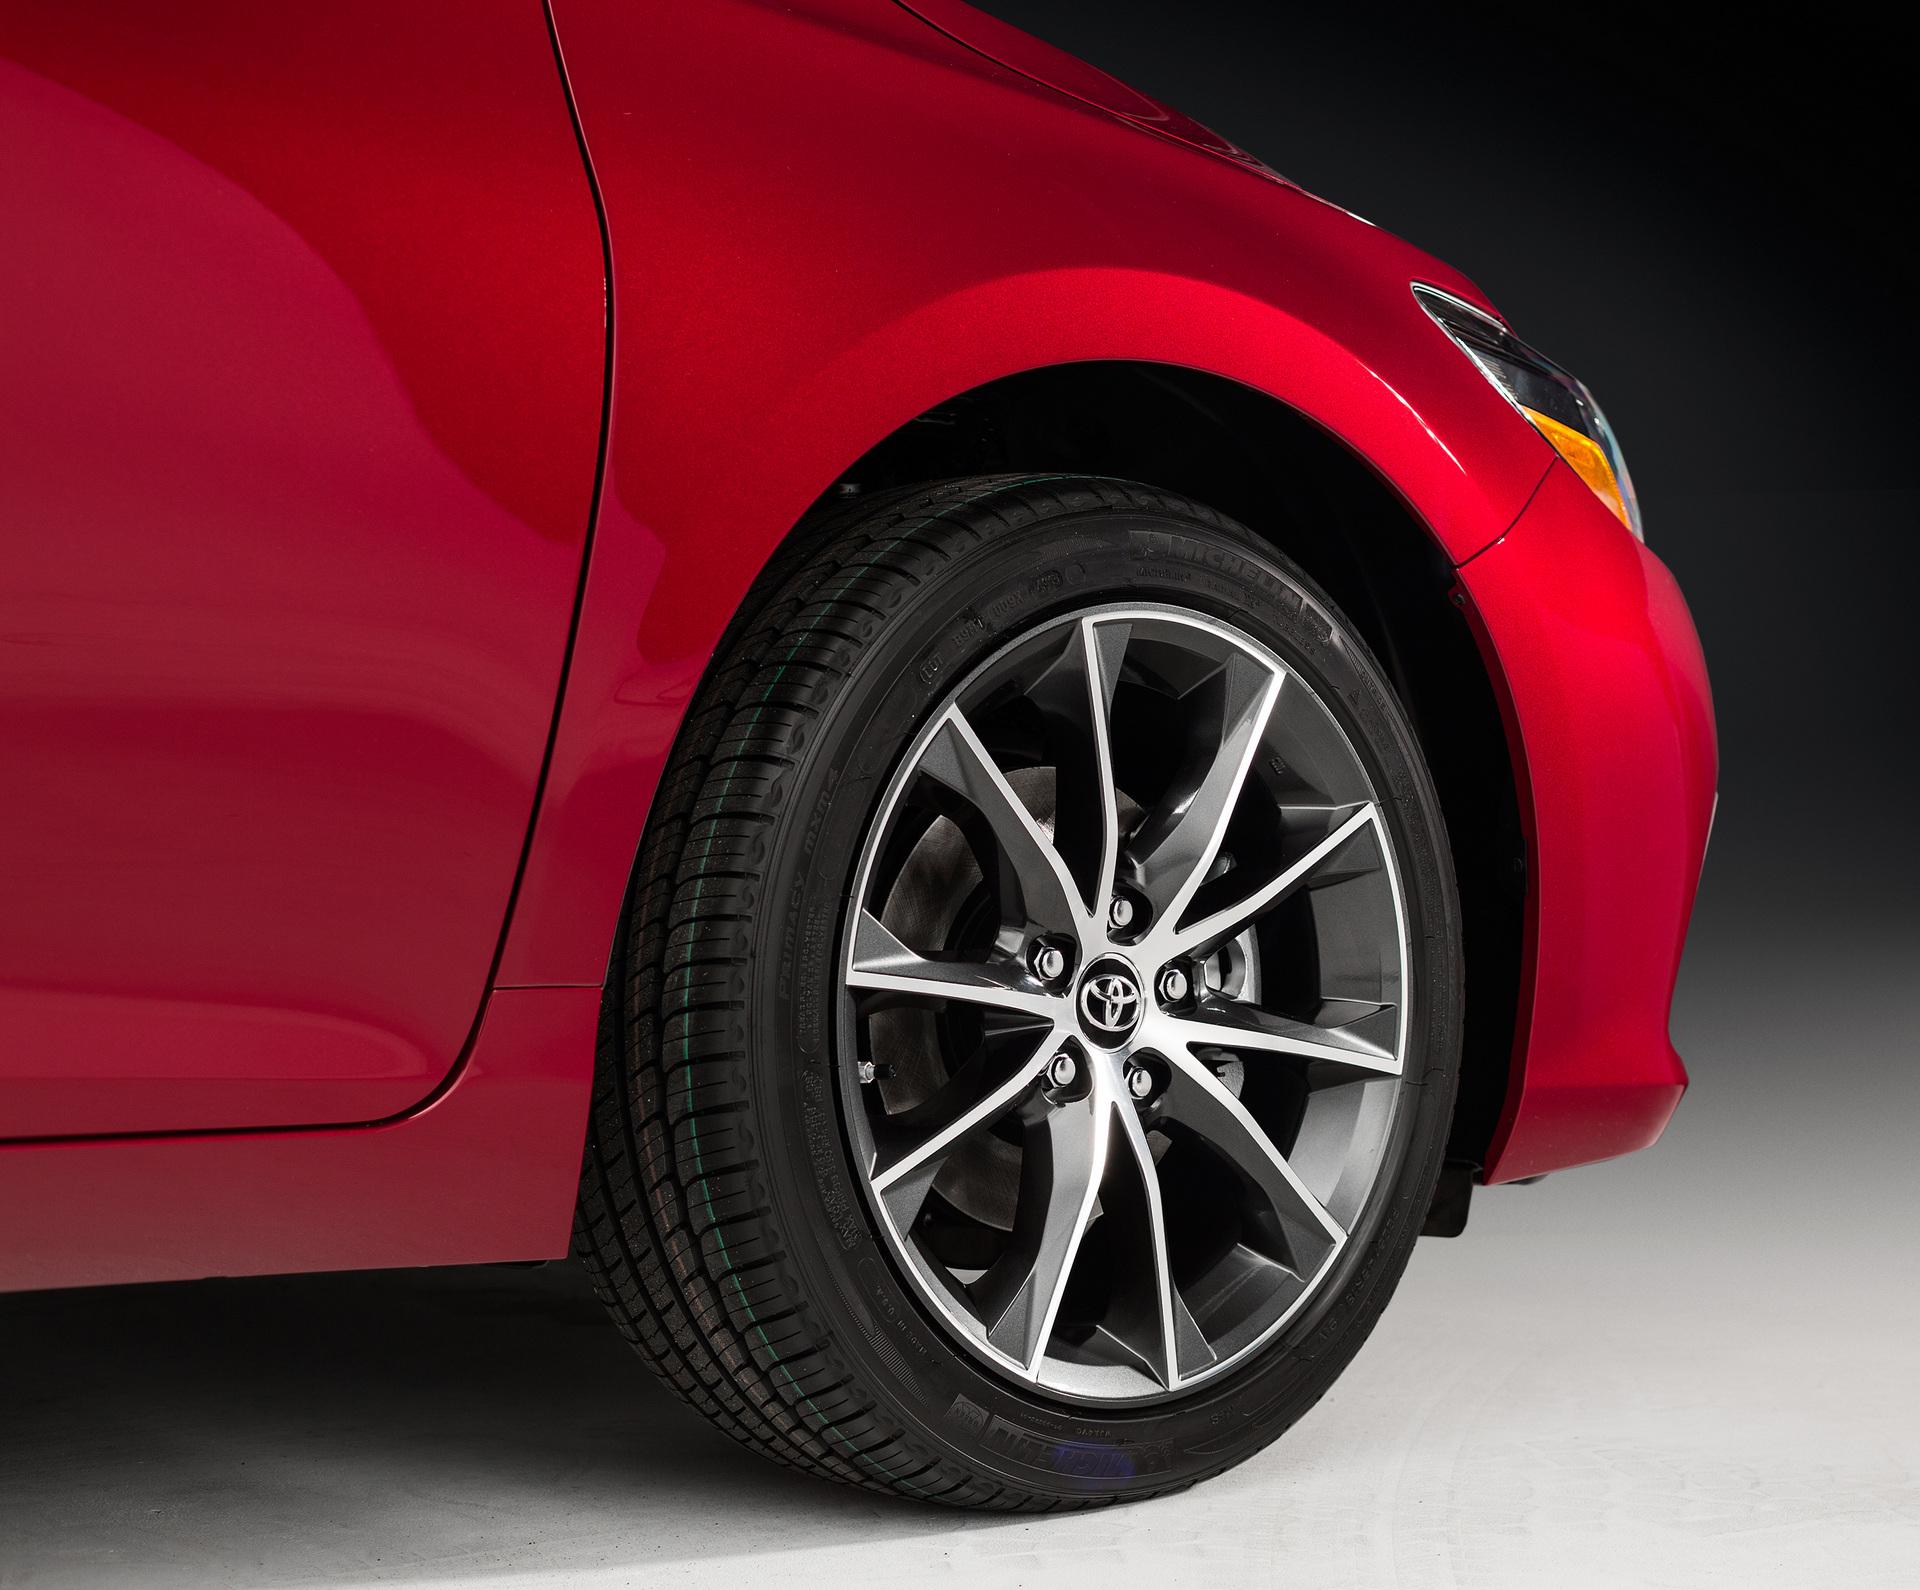 2016 Toyota Camry XSE © Toyota Motor Corporation